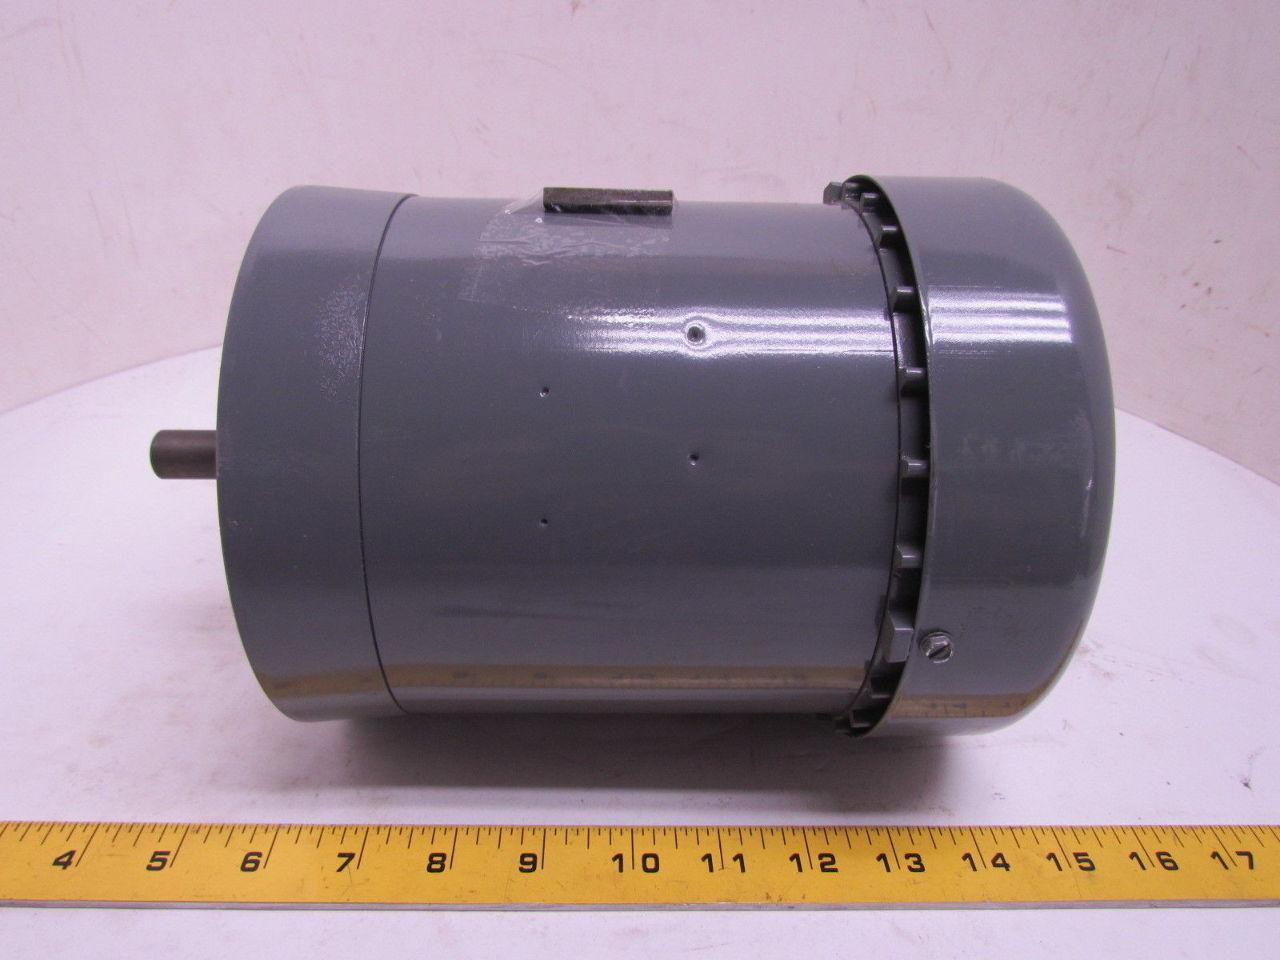 Dayton 2n915g 1 3 hp 1725 rpm 208 220 440 volt 56c frame for 1 4 hp 1725 rpm motor